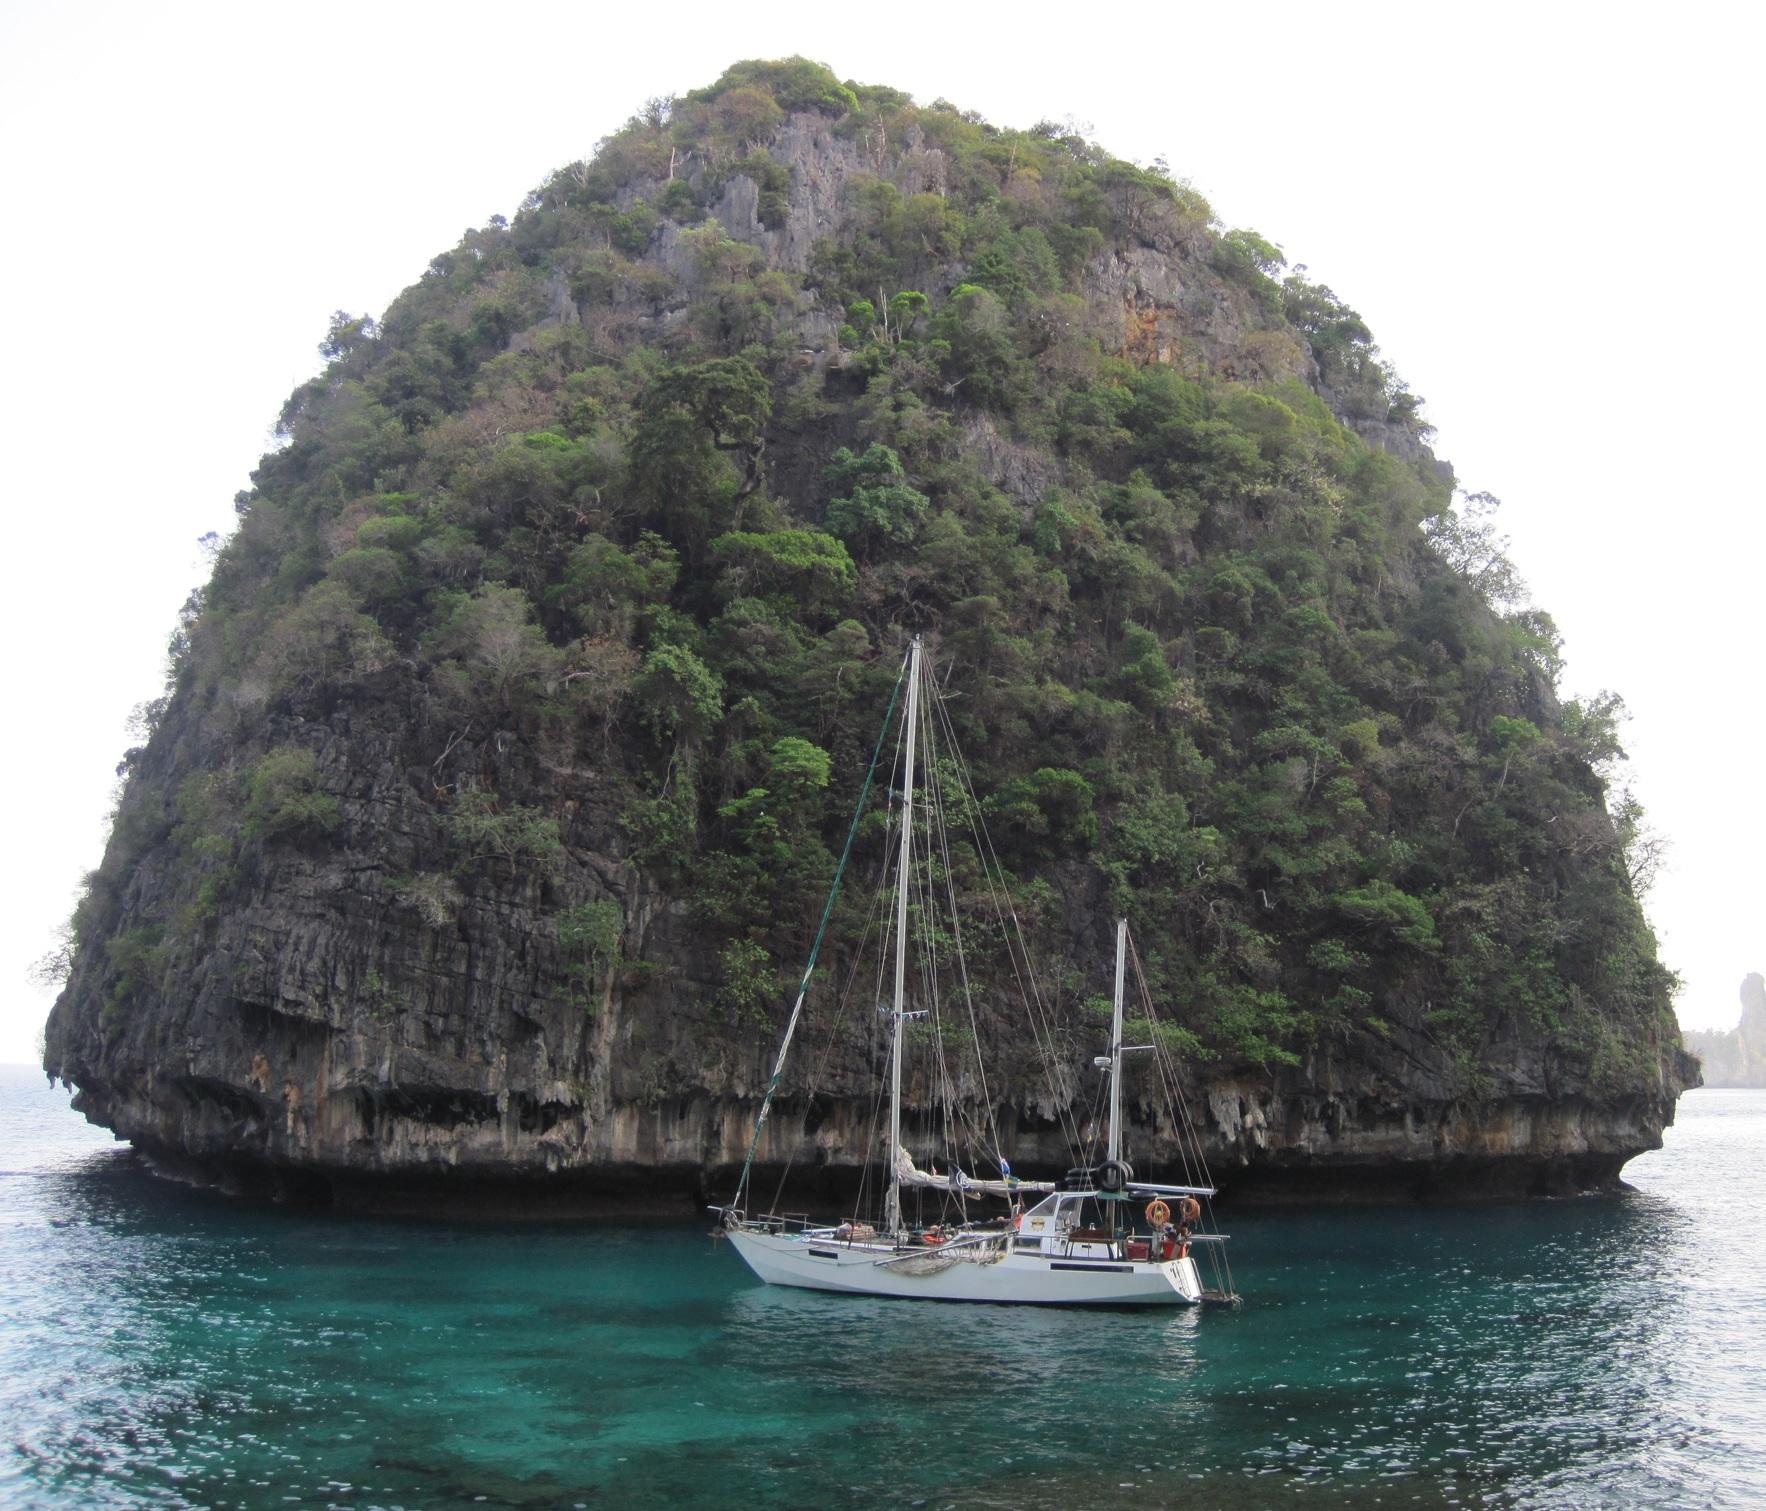 Koh Phi Phi Leh: Koh Phi Phi: Beauty Is A Burden